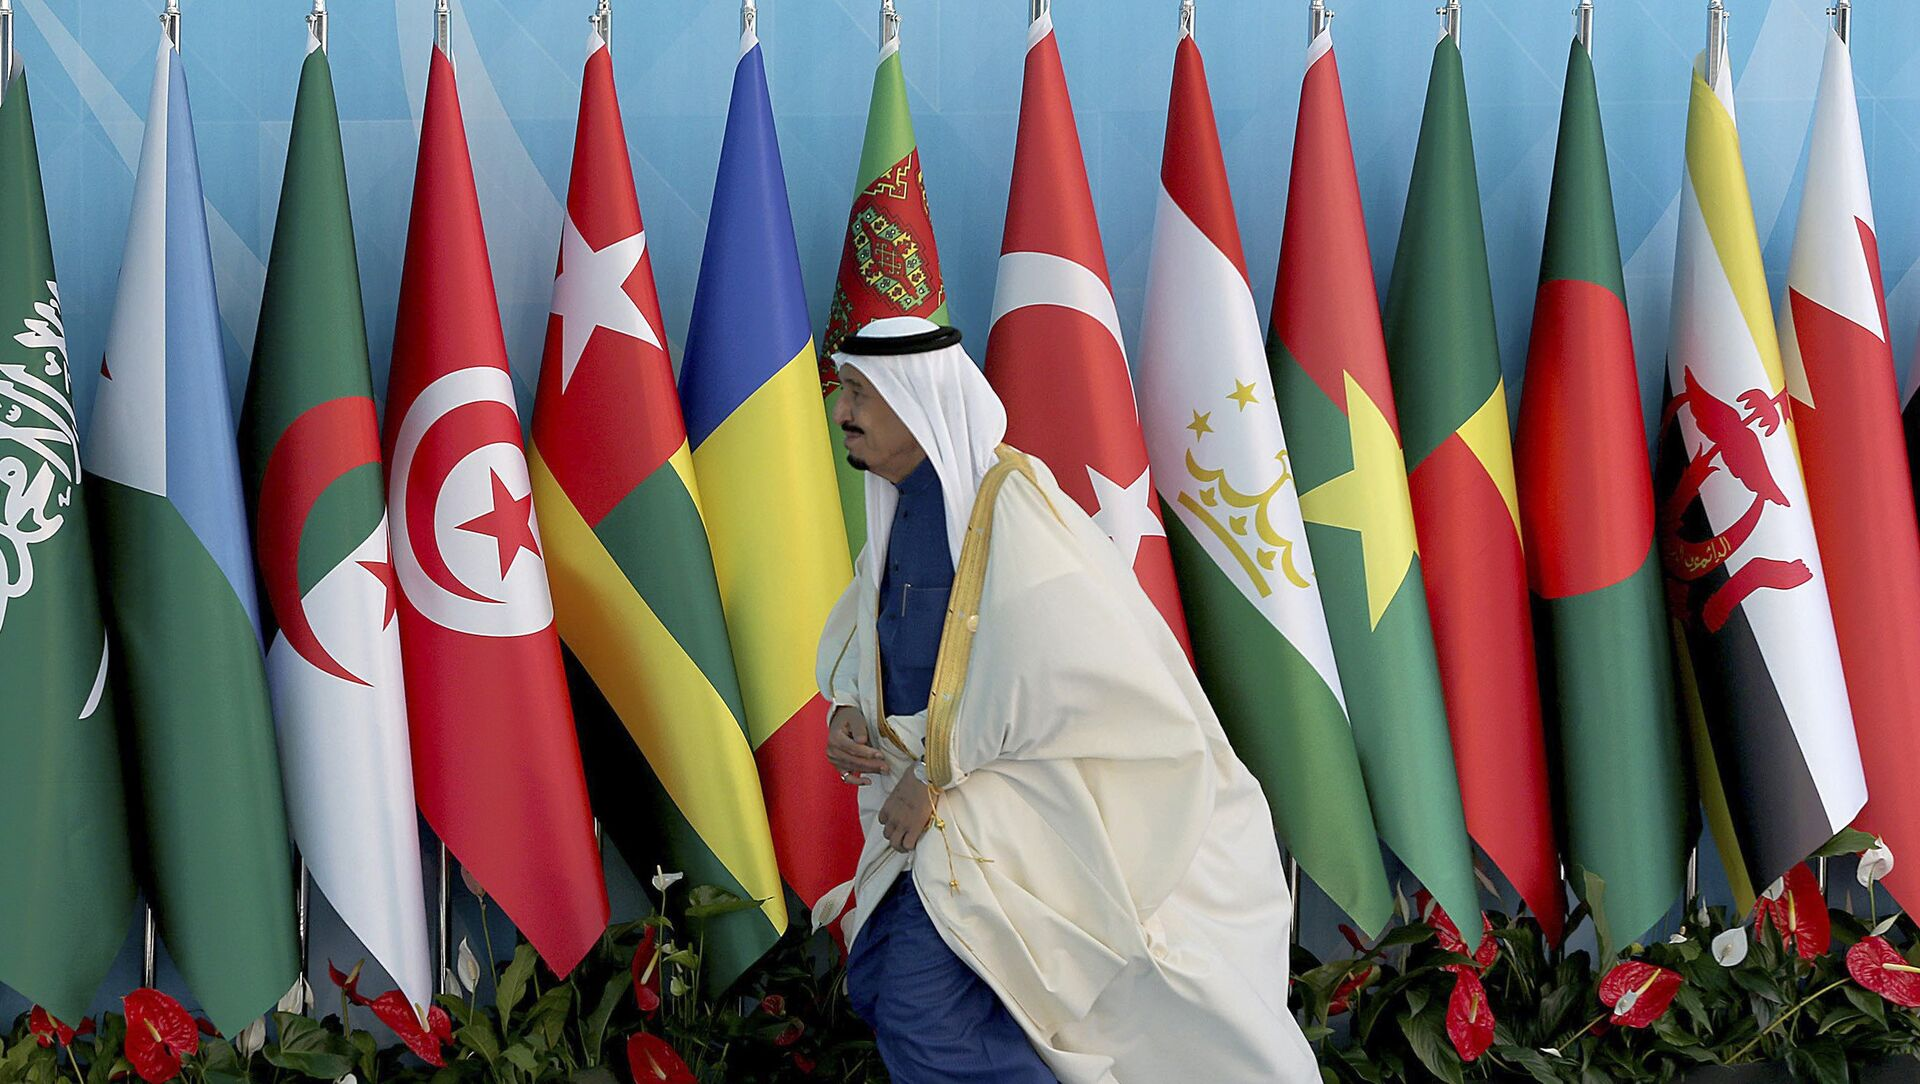 Флаги стран ОИС во время саммита в Стамбуле, 14 апреля 2016 года - Sputnik Azərbaycan, 1920, 23.09.2021